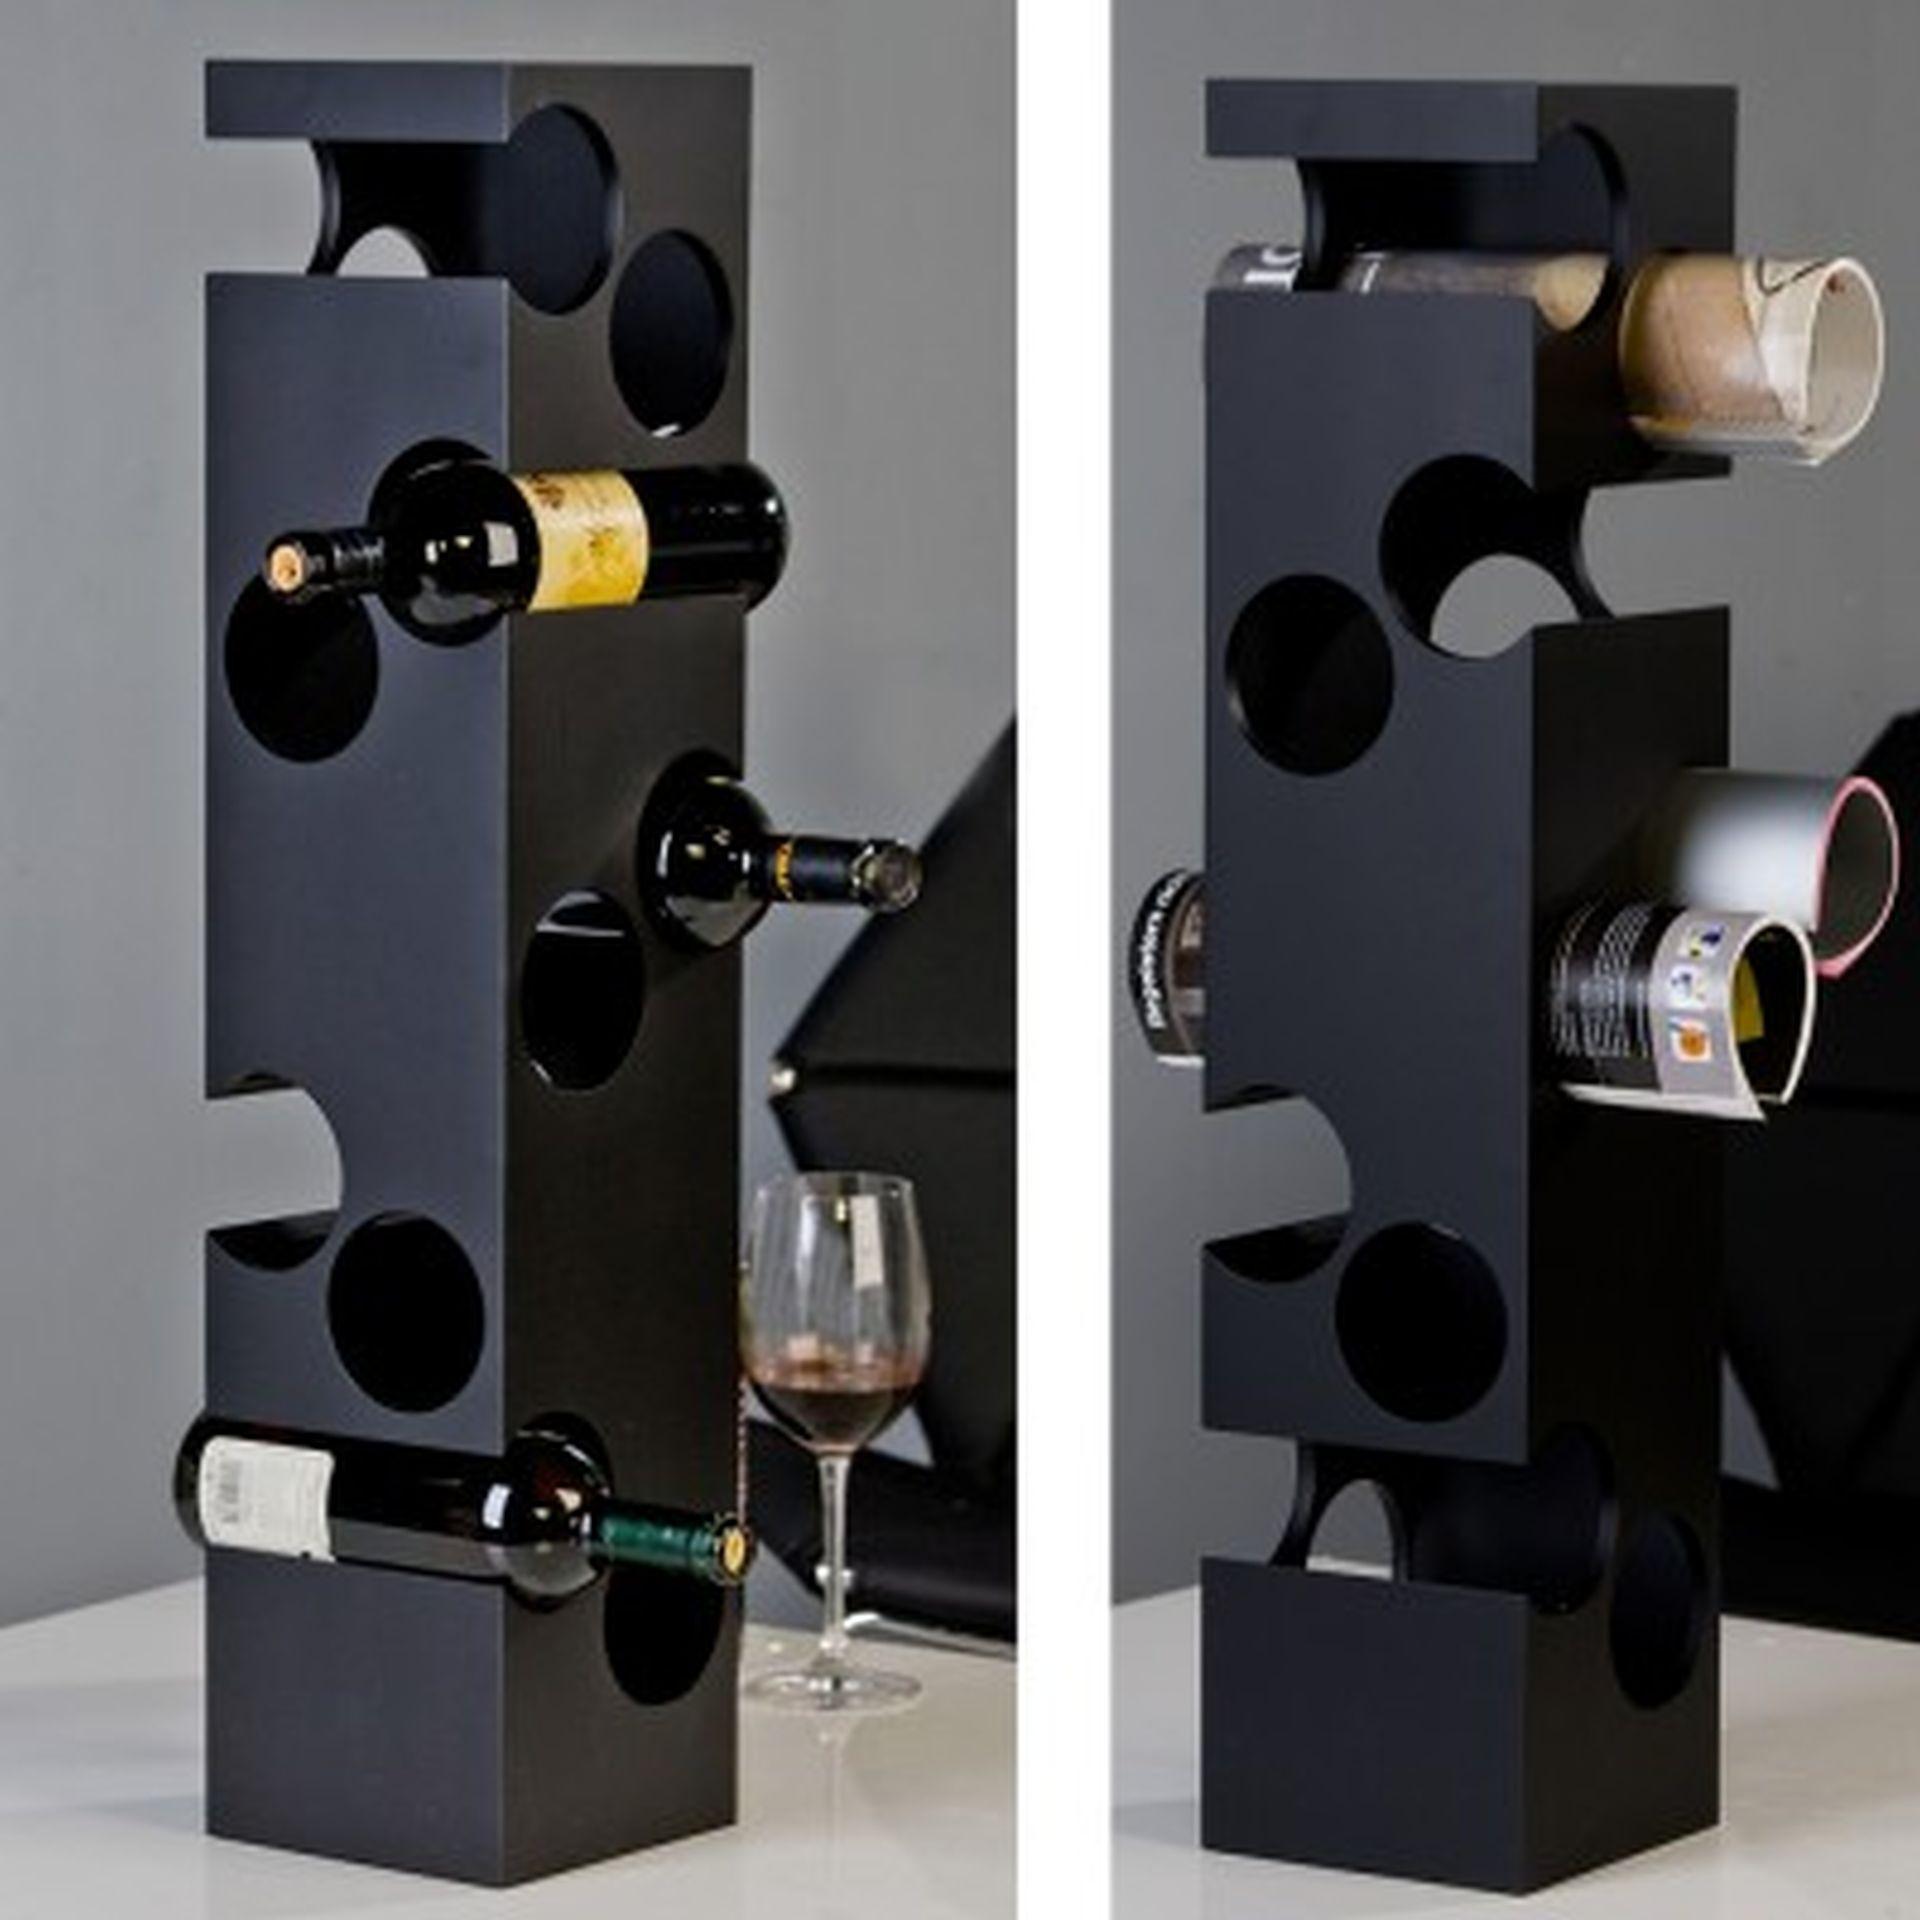 d rkov zbo eshop. Black Bedroom Furniture Sets. Home Design Ideas